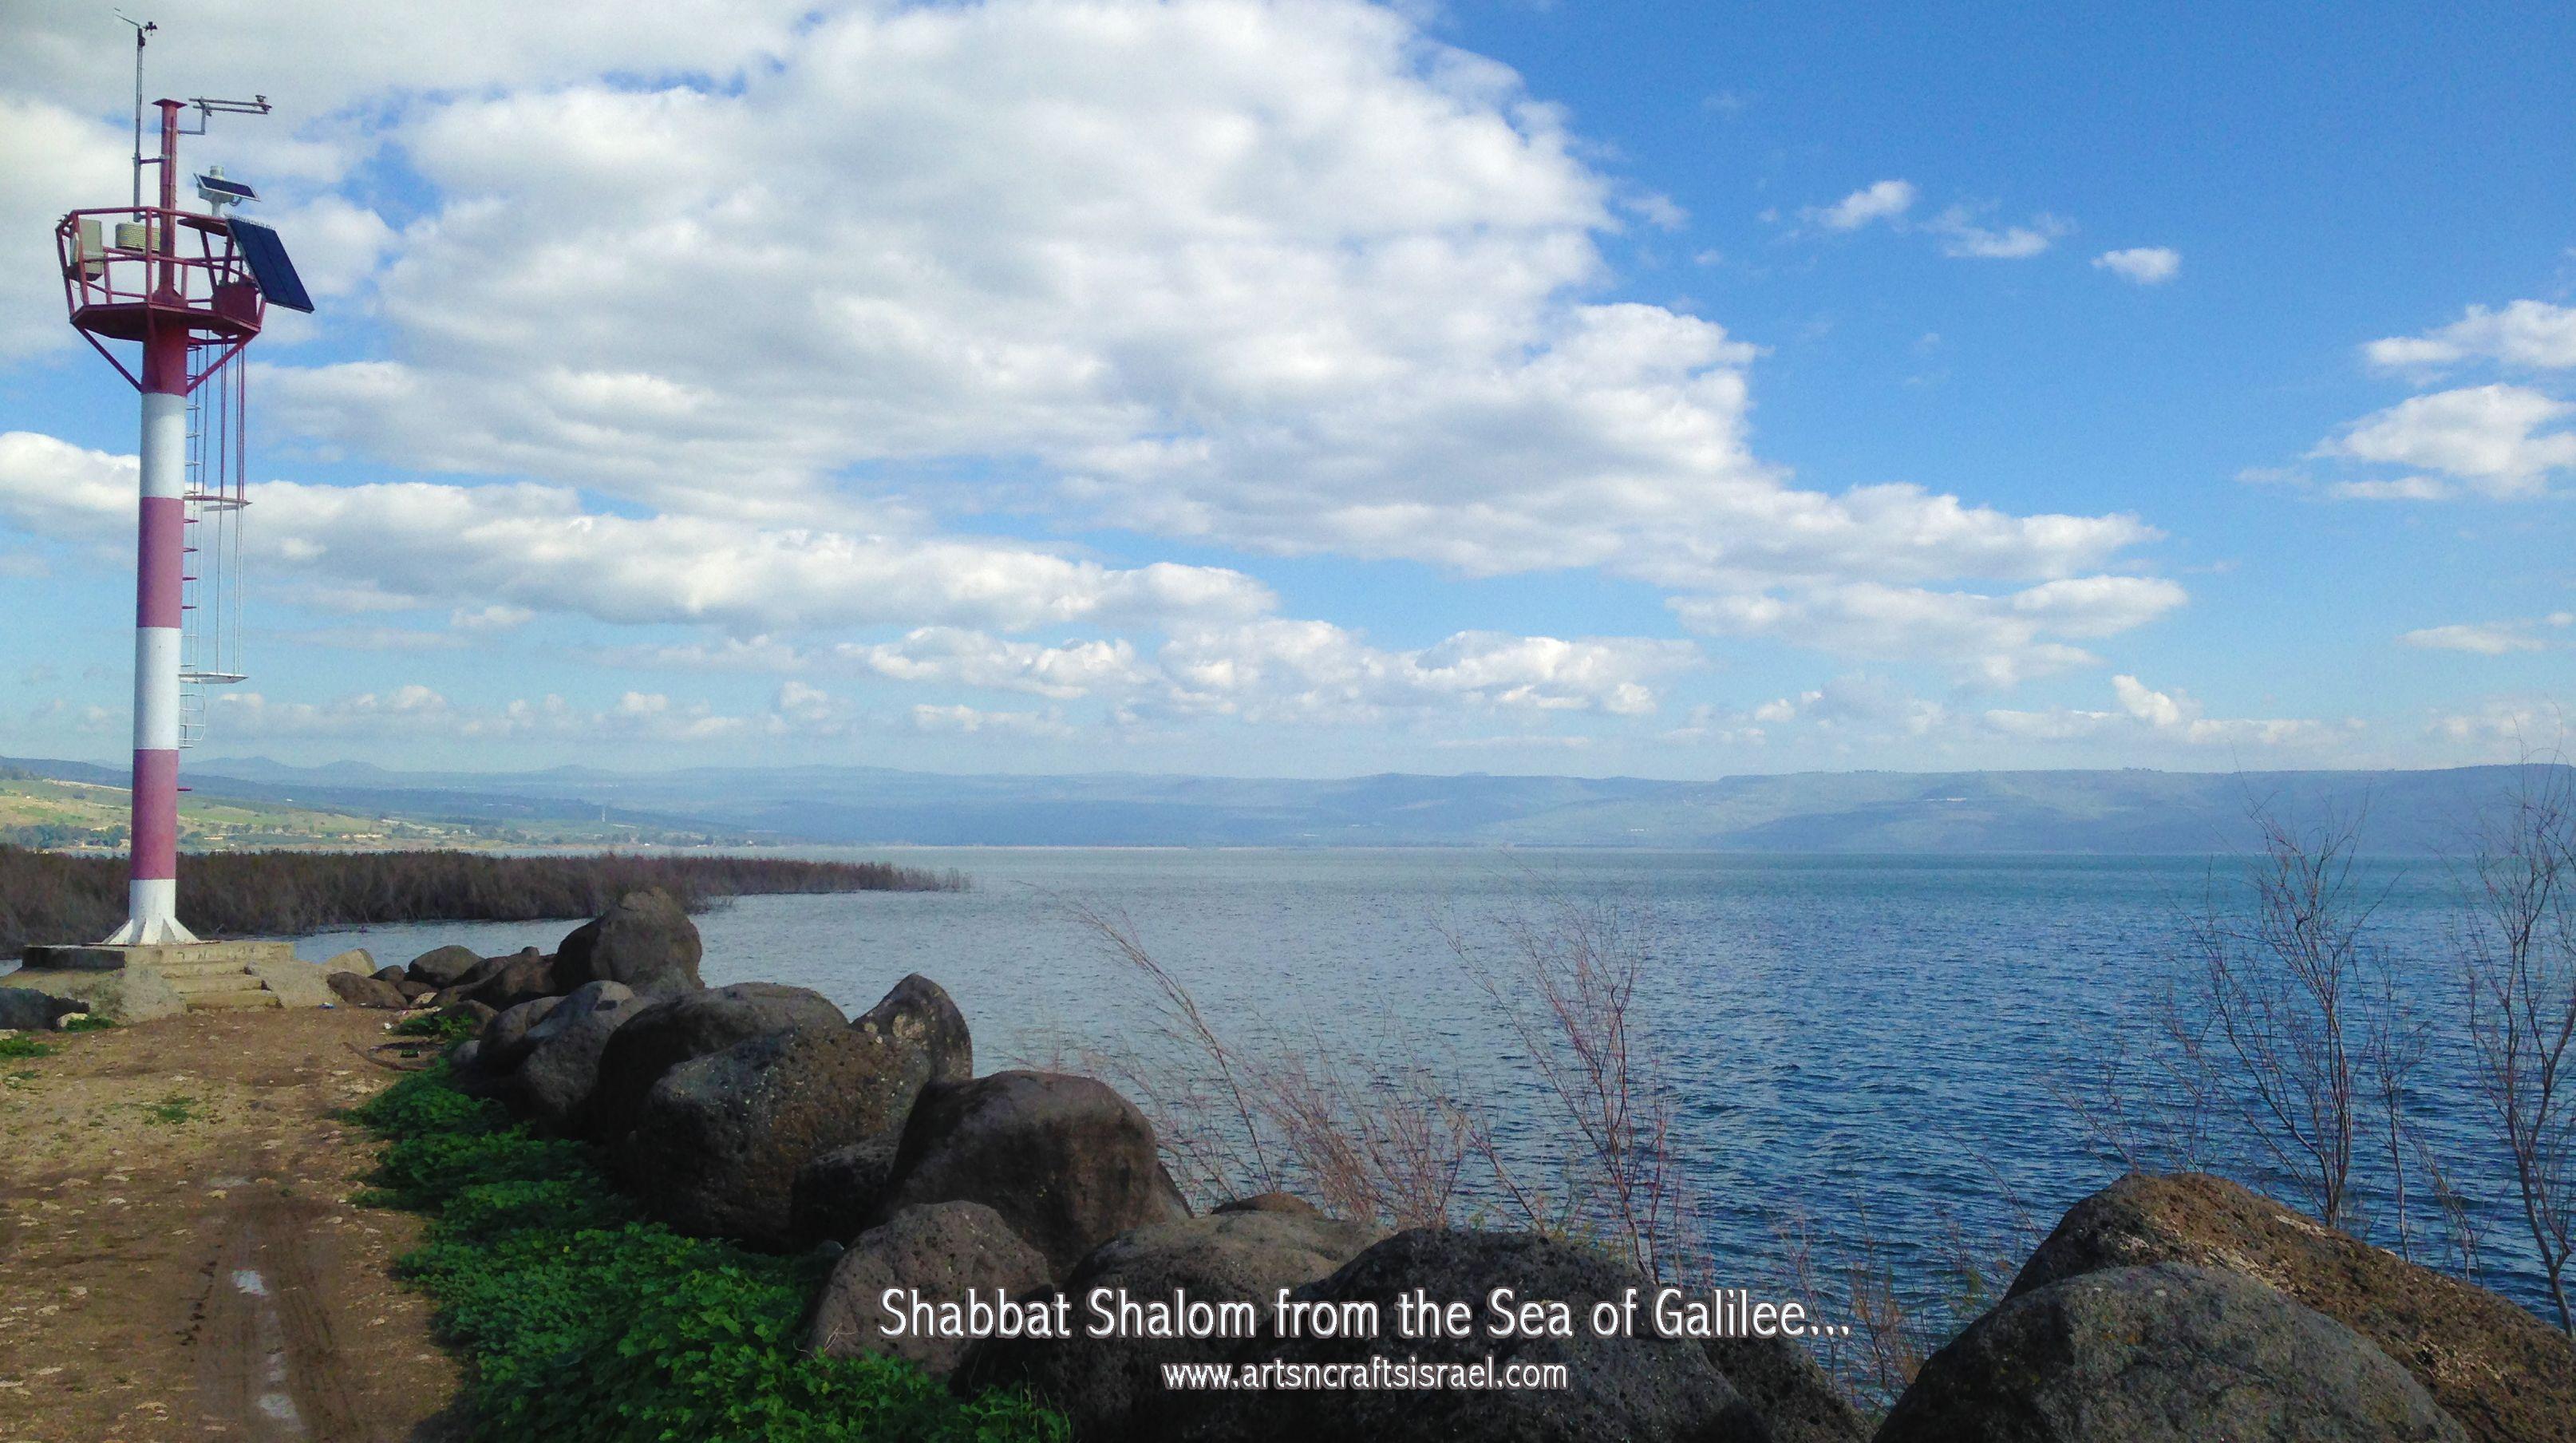 Park Art|My WordPress Blog_When Does Shabbat End In Israel